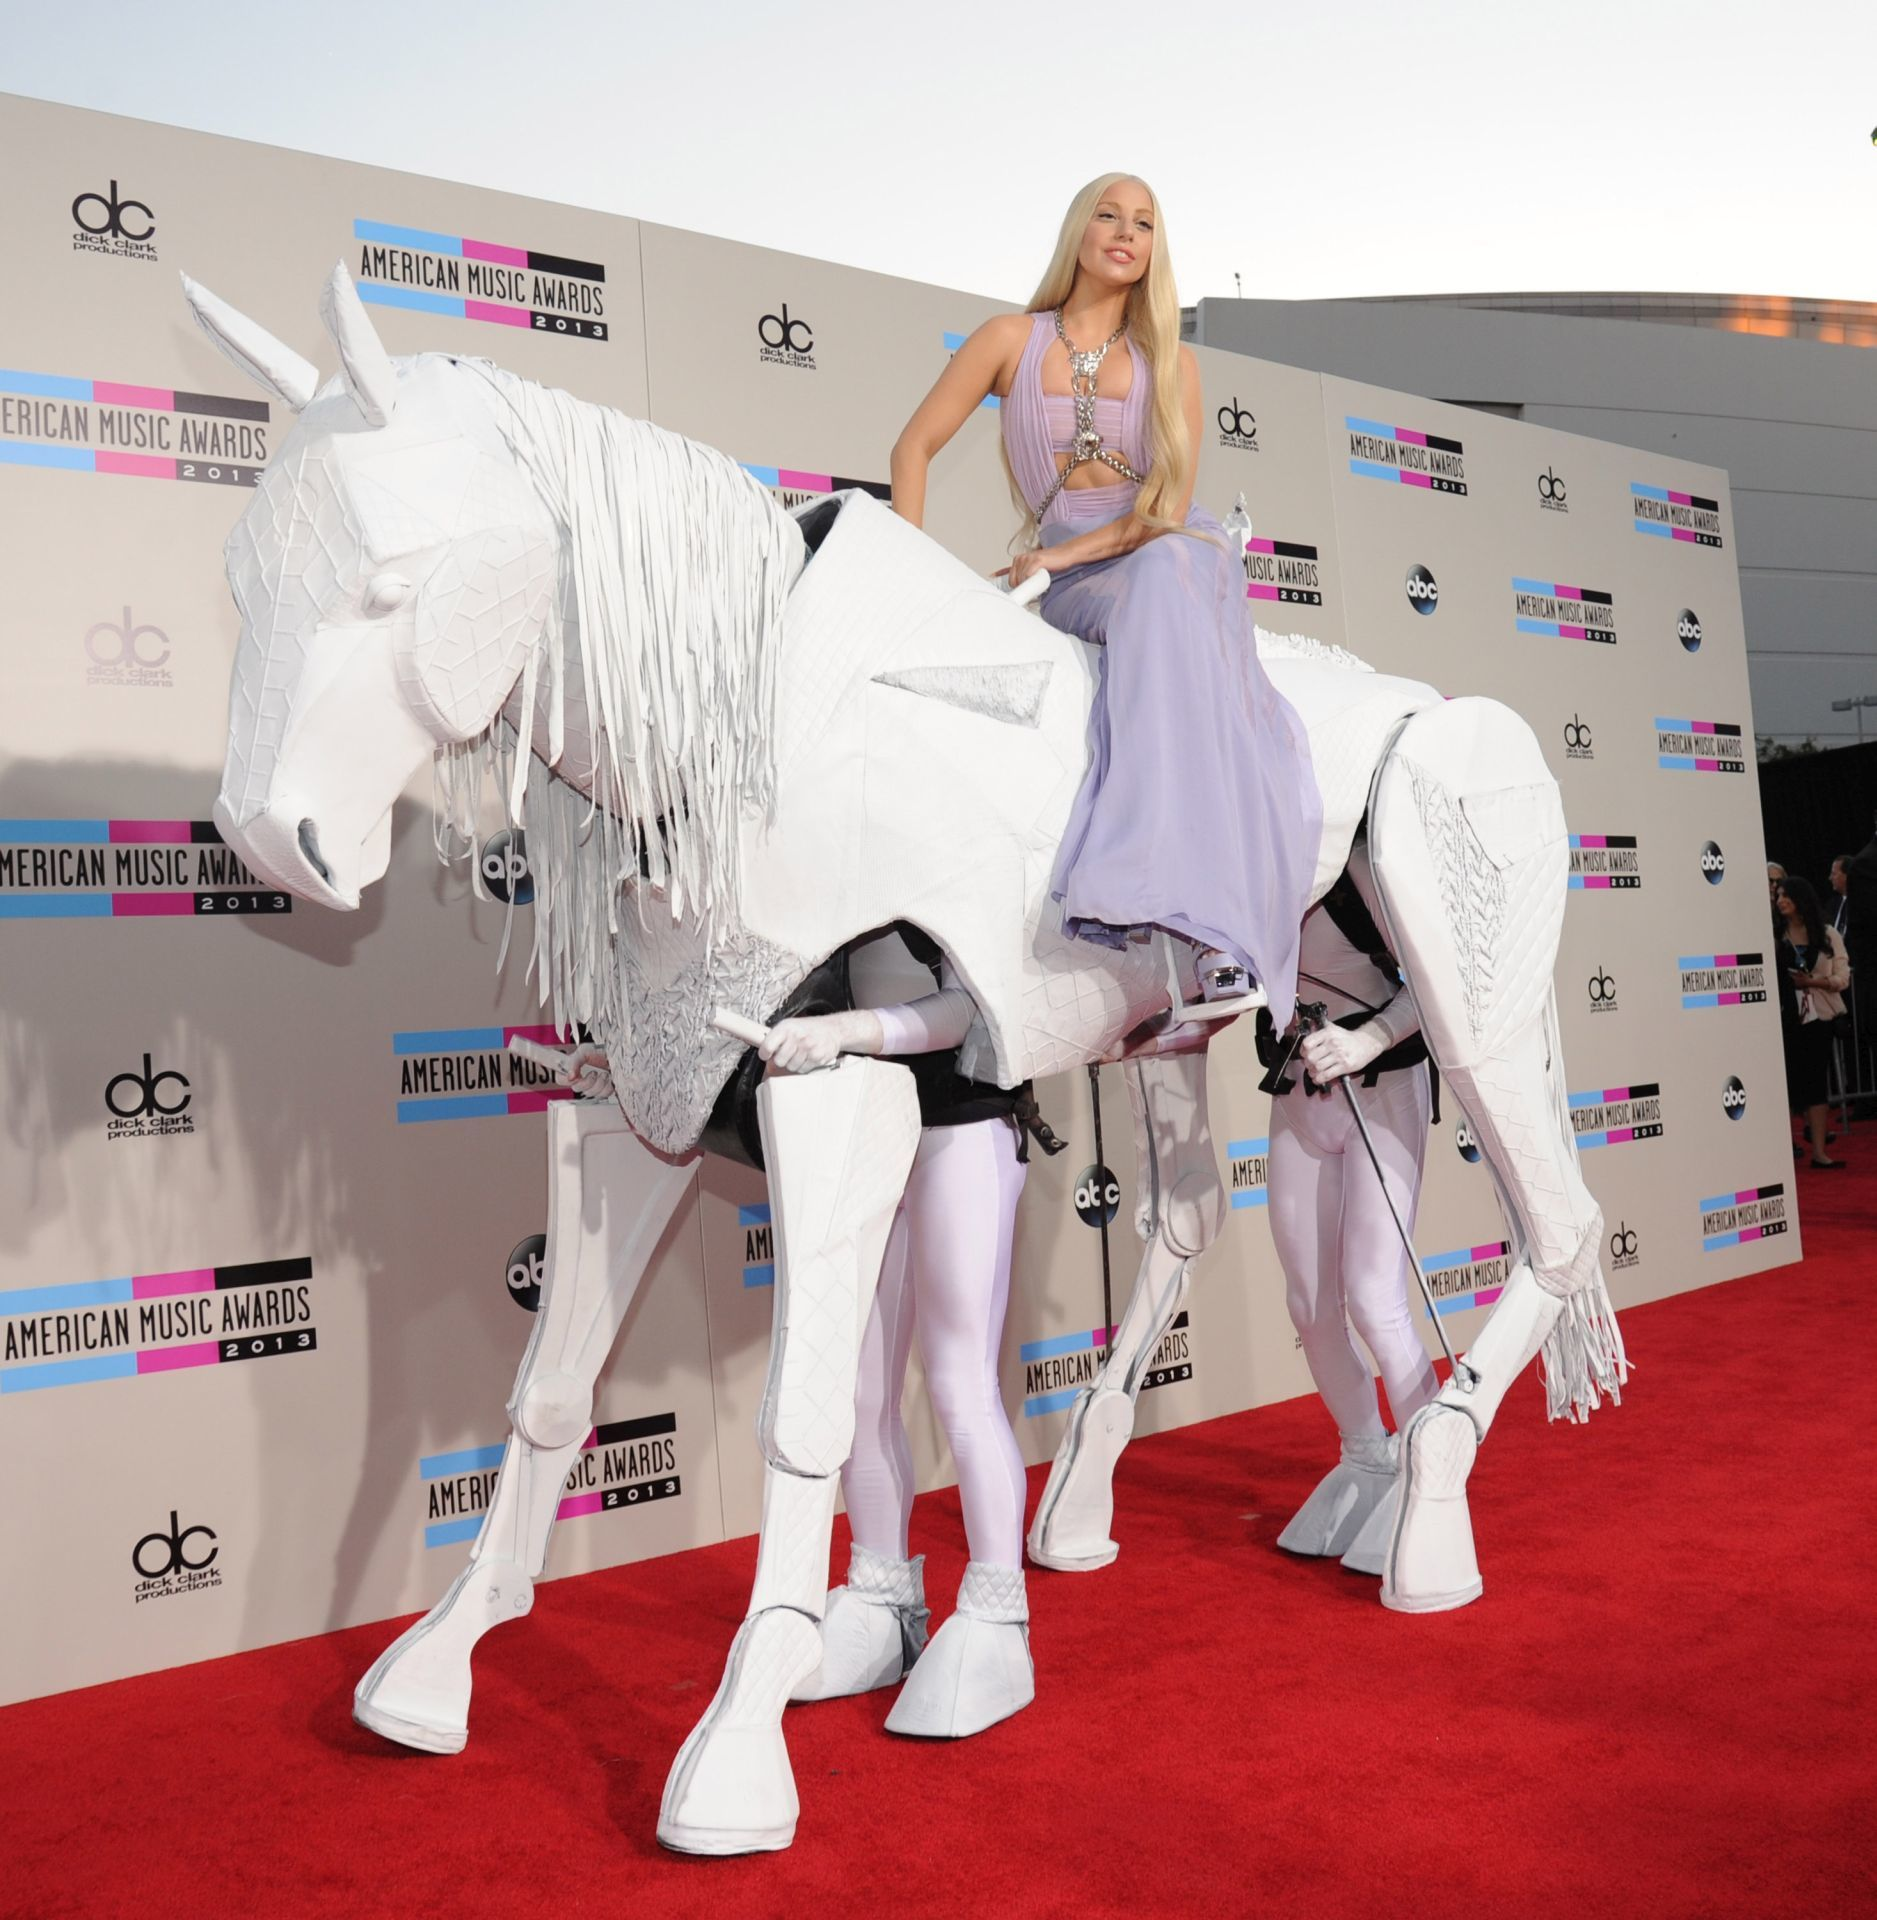 Lady Gaga a 2013-as American Music Awards díjátadón. (Fotó: Kevin Mazur/AMA2013/WireImage)